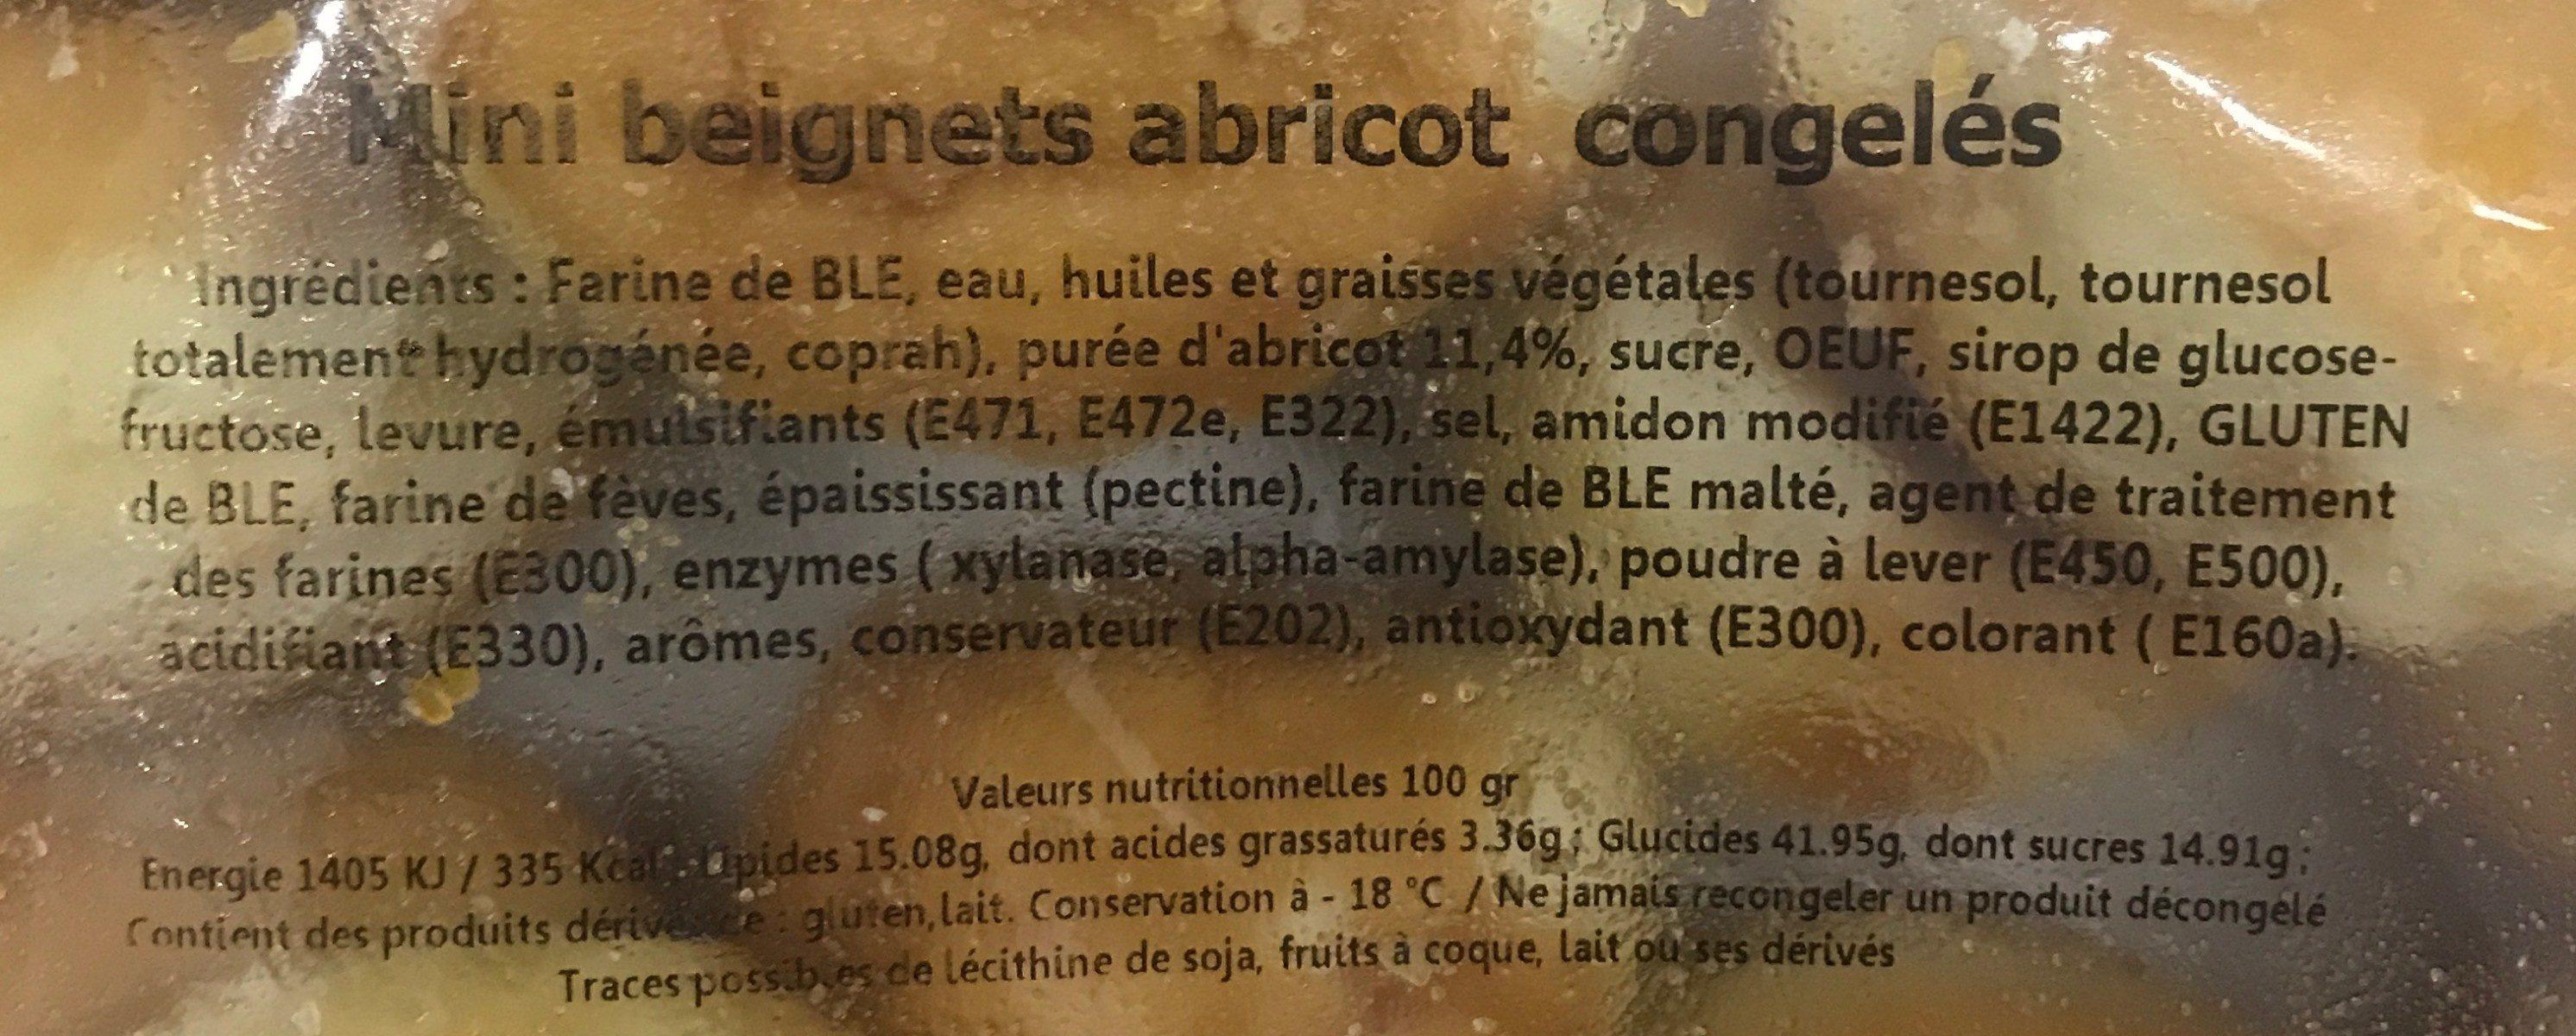 Mini beignets abricot congelés - Ingredients - fr